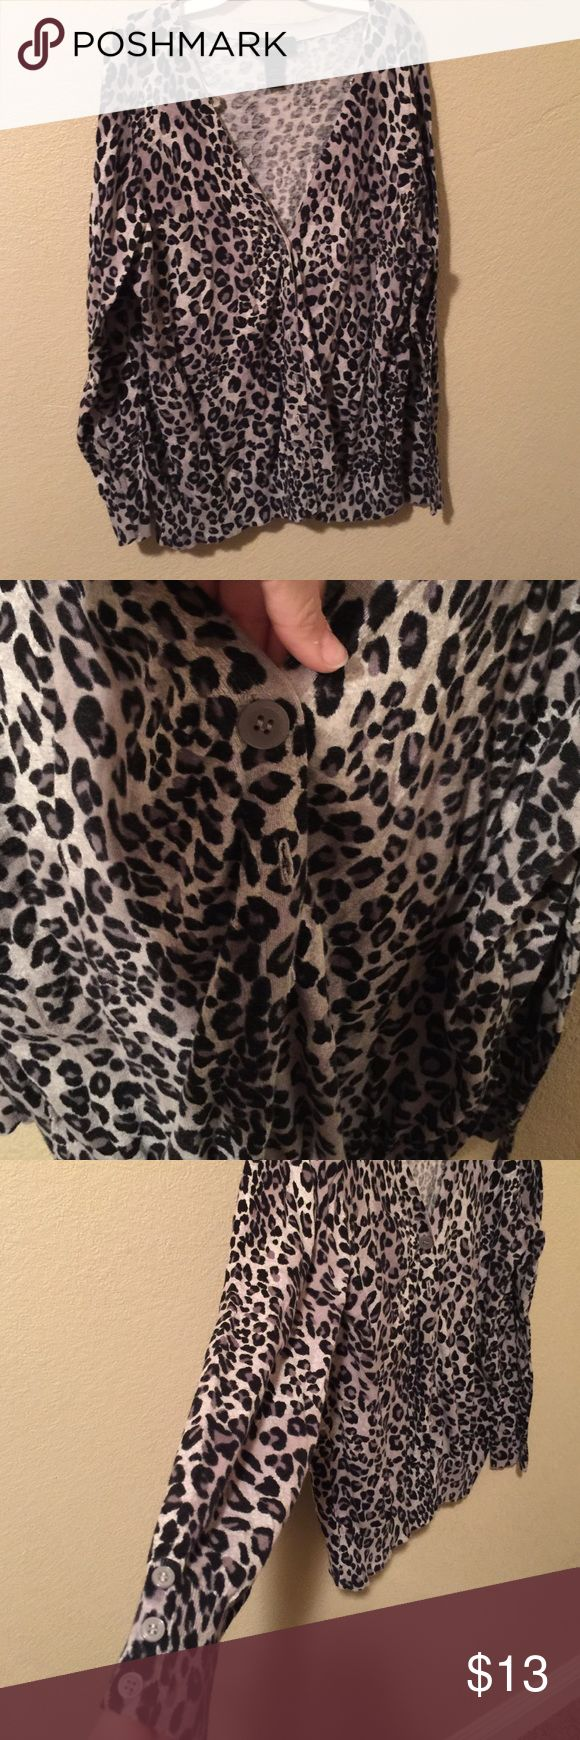 Grey cheetah cardigan size 18/20 Grey cheetah cardigan size 18/20 grey button accents Lane Bryant Sweaters Cardigans